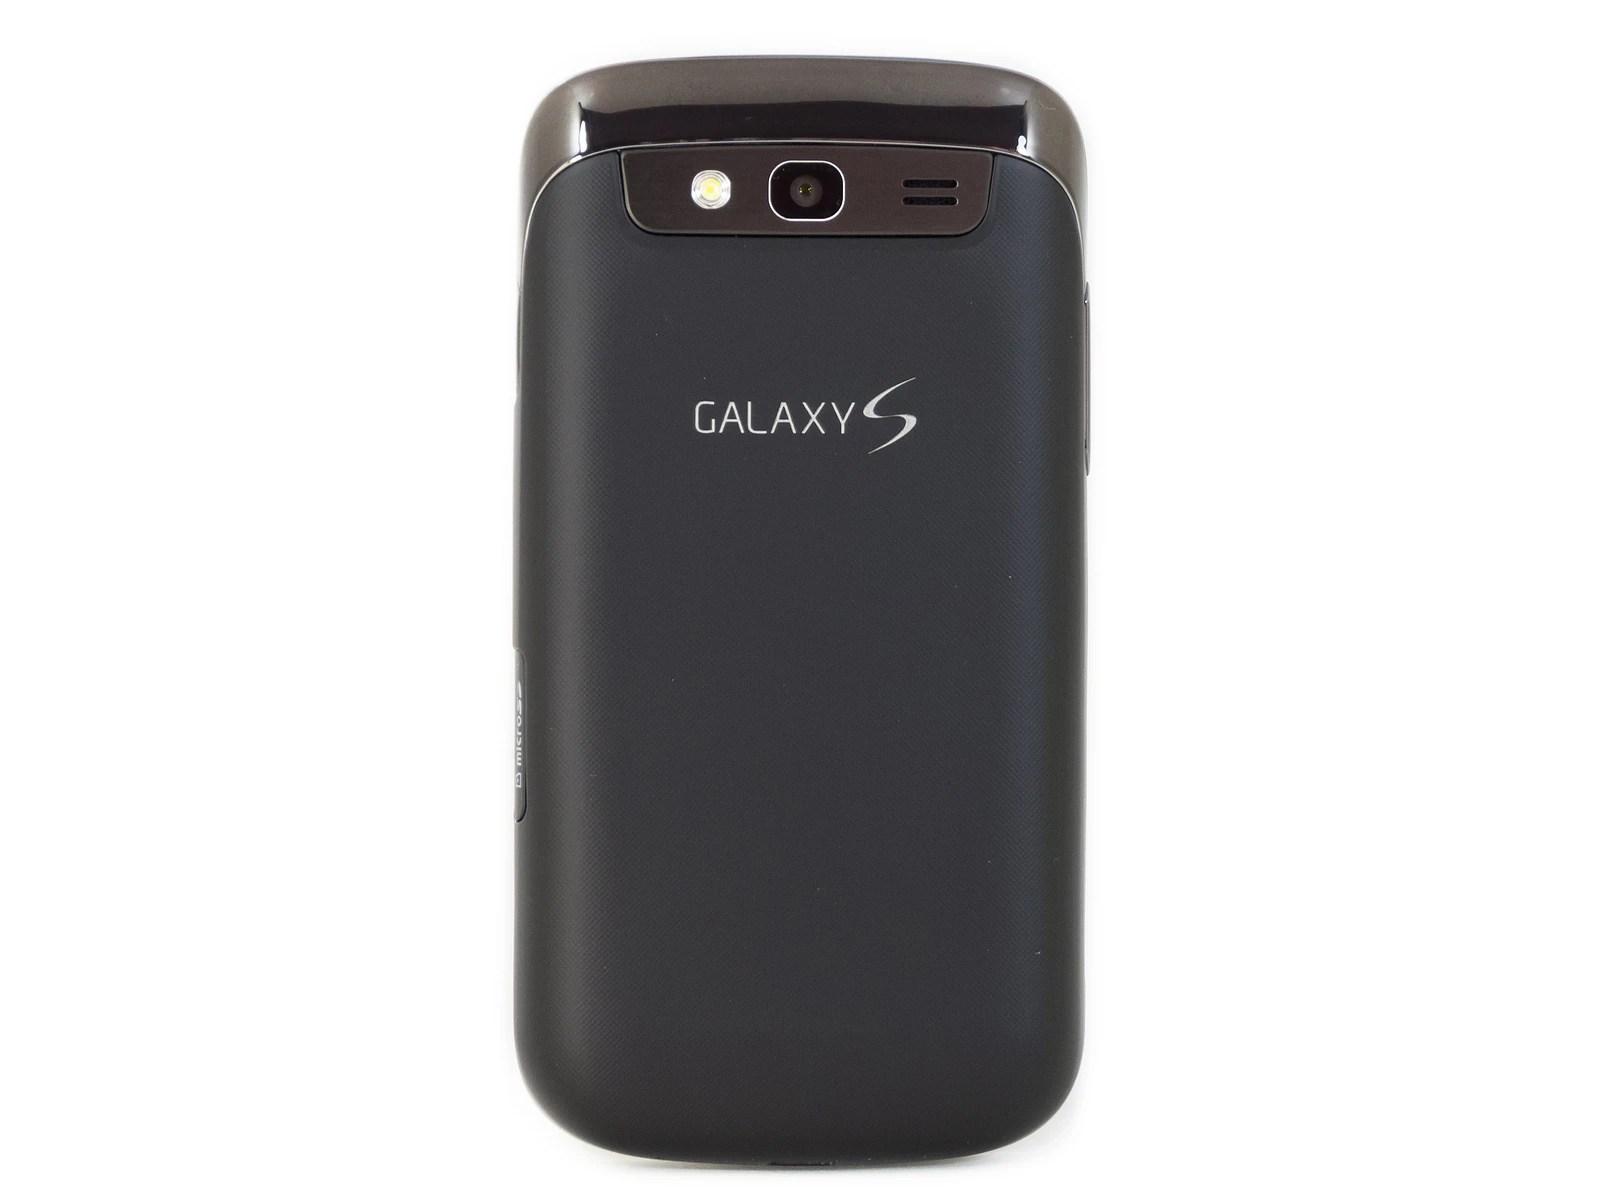 Samsung Galaxy S Blaze 4G Specs